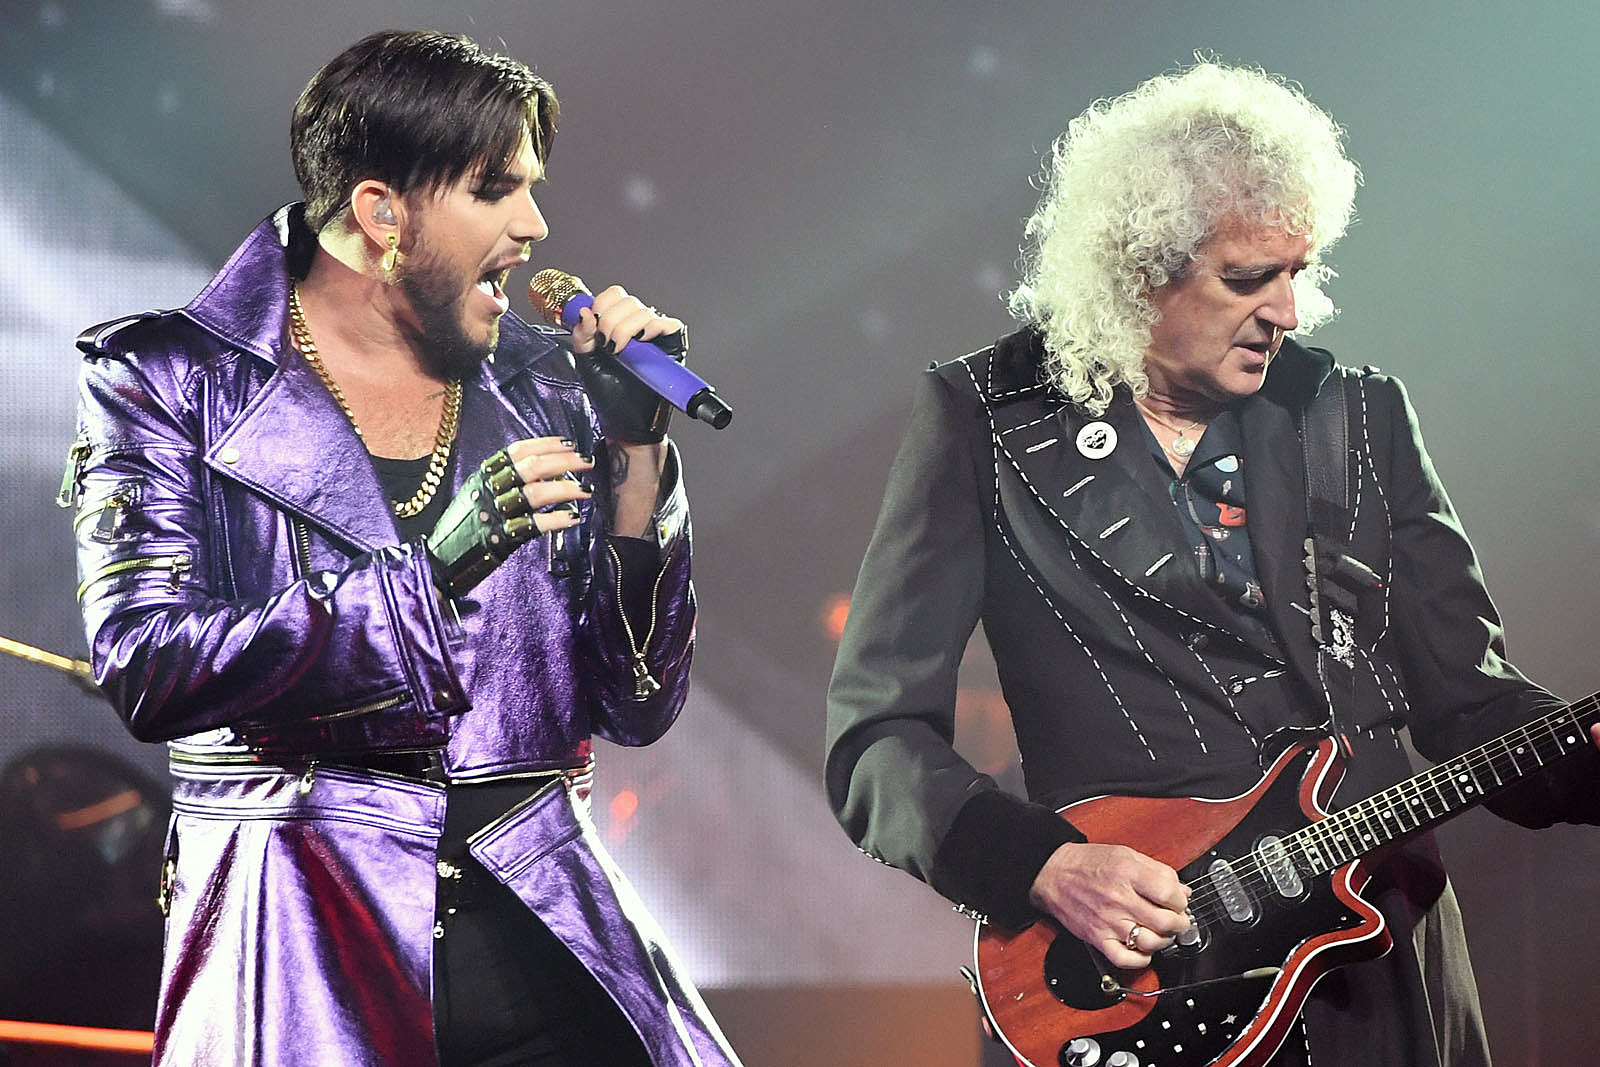 Queen + Adam Lambert to Perform at the Oscars